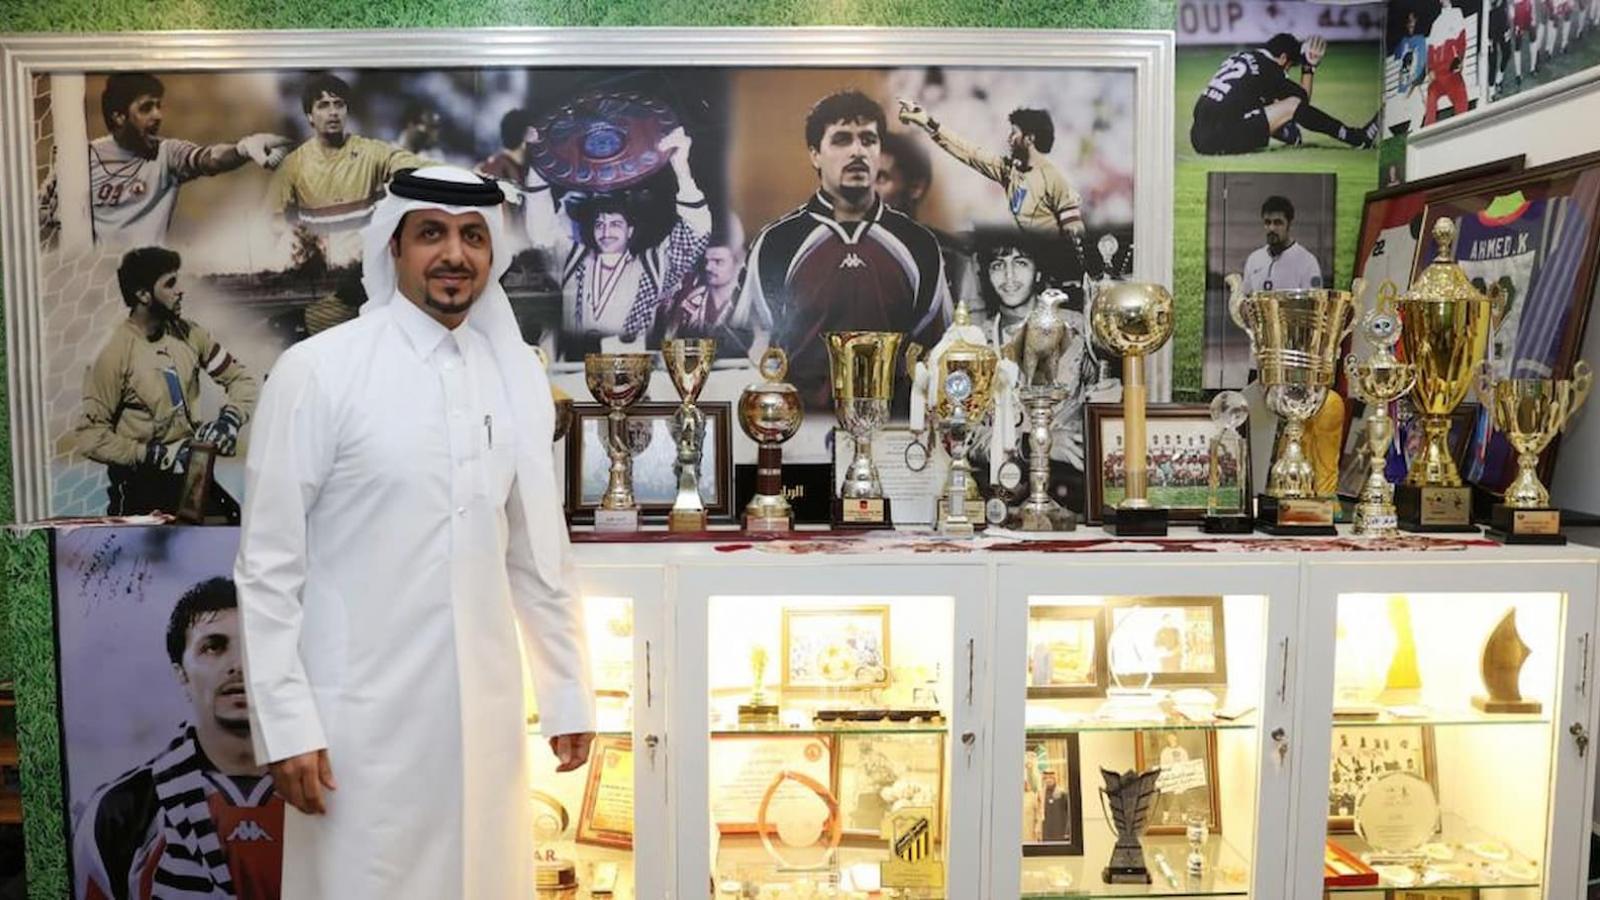 Qatari football continues to make great strides on the road to 2022: Ahmad Khalil